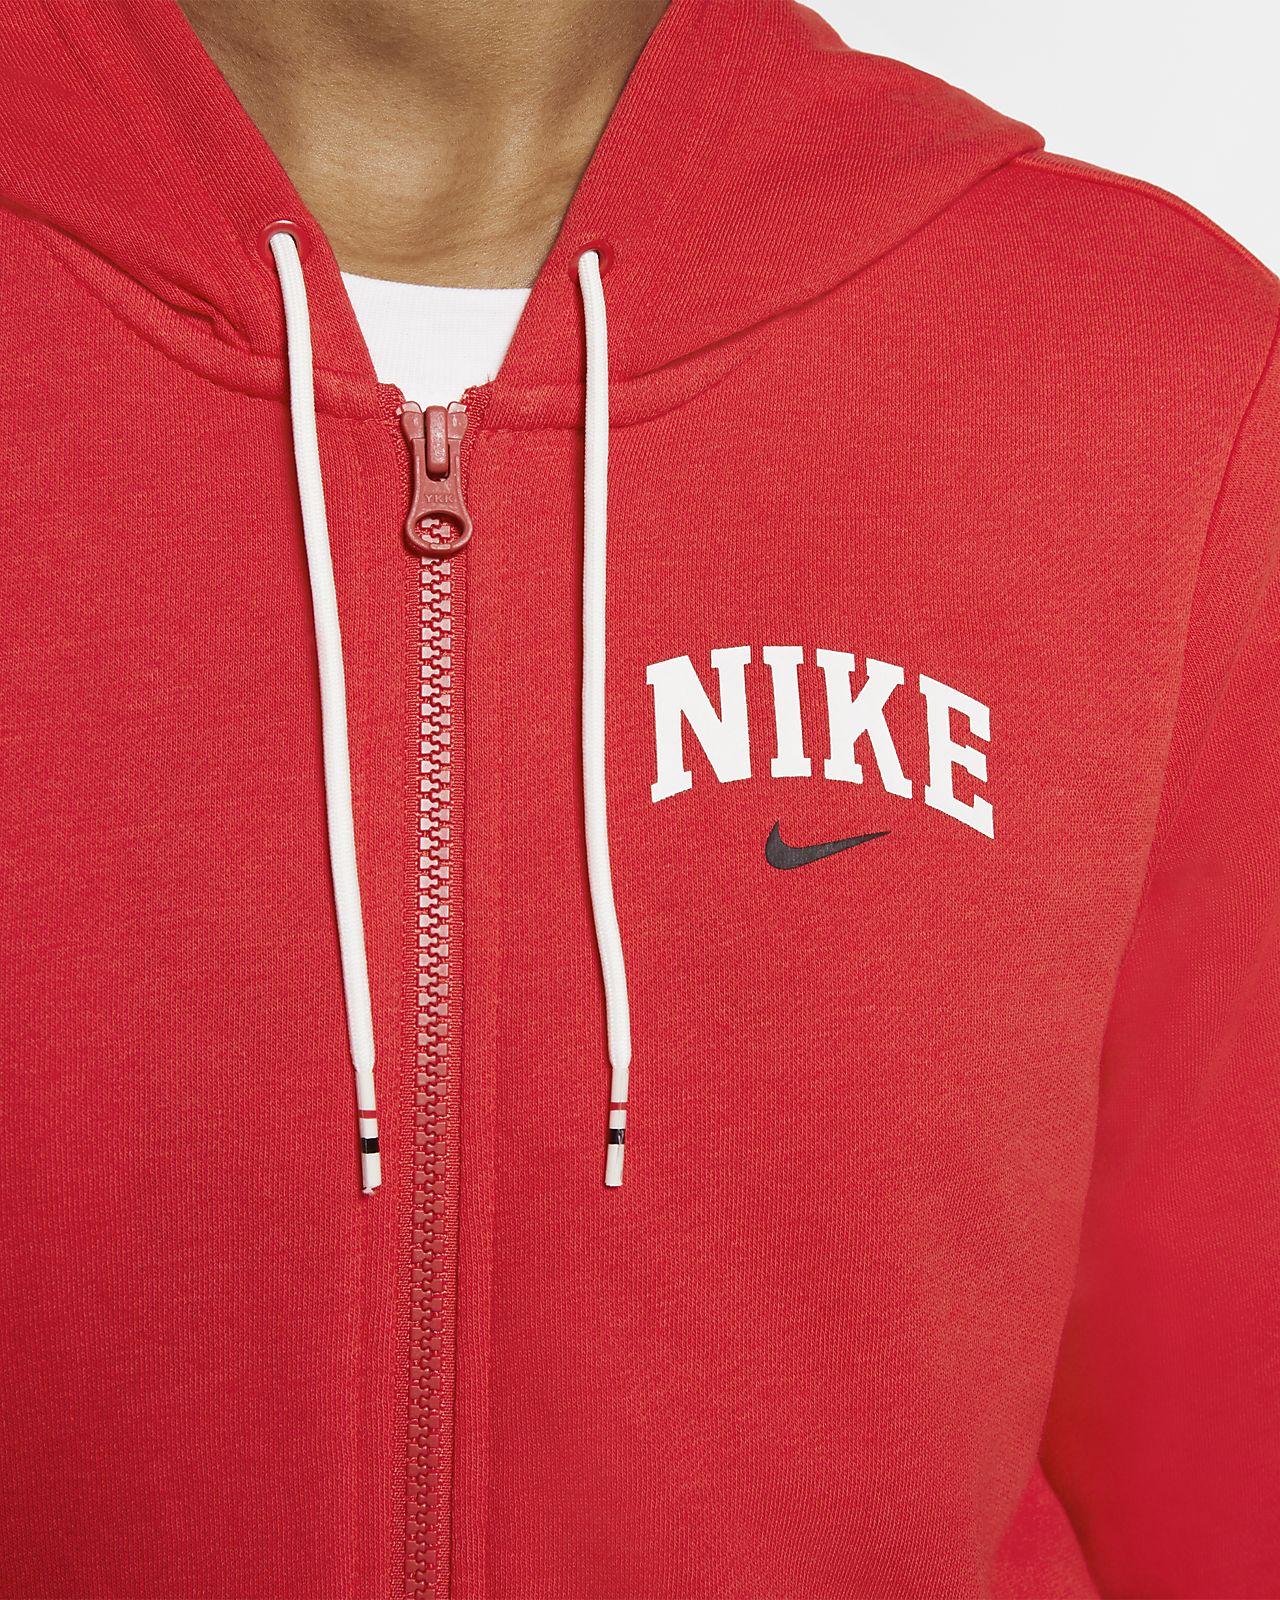 Nike Dri Fit Fleece Full Zip ab 51,95 € | Preisvergleich bei